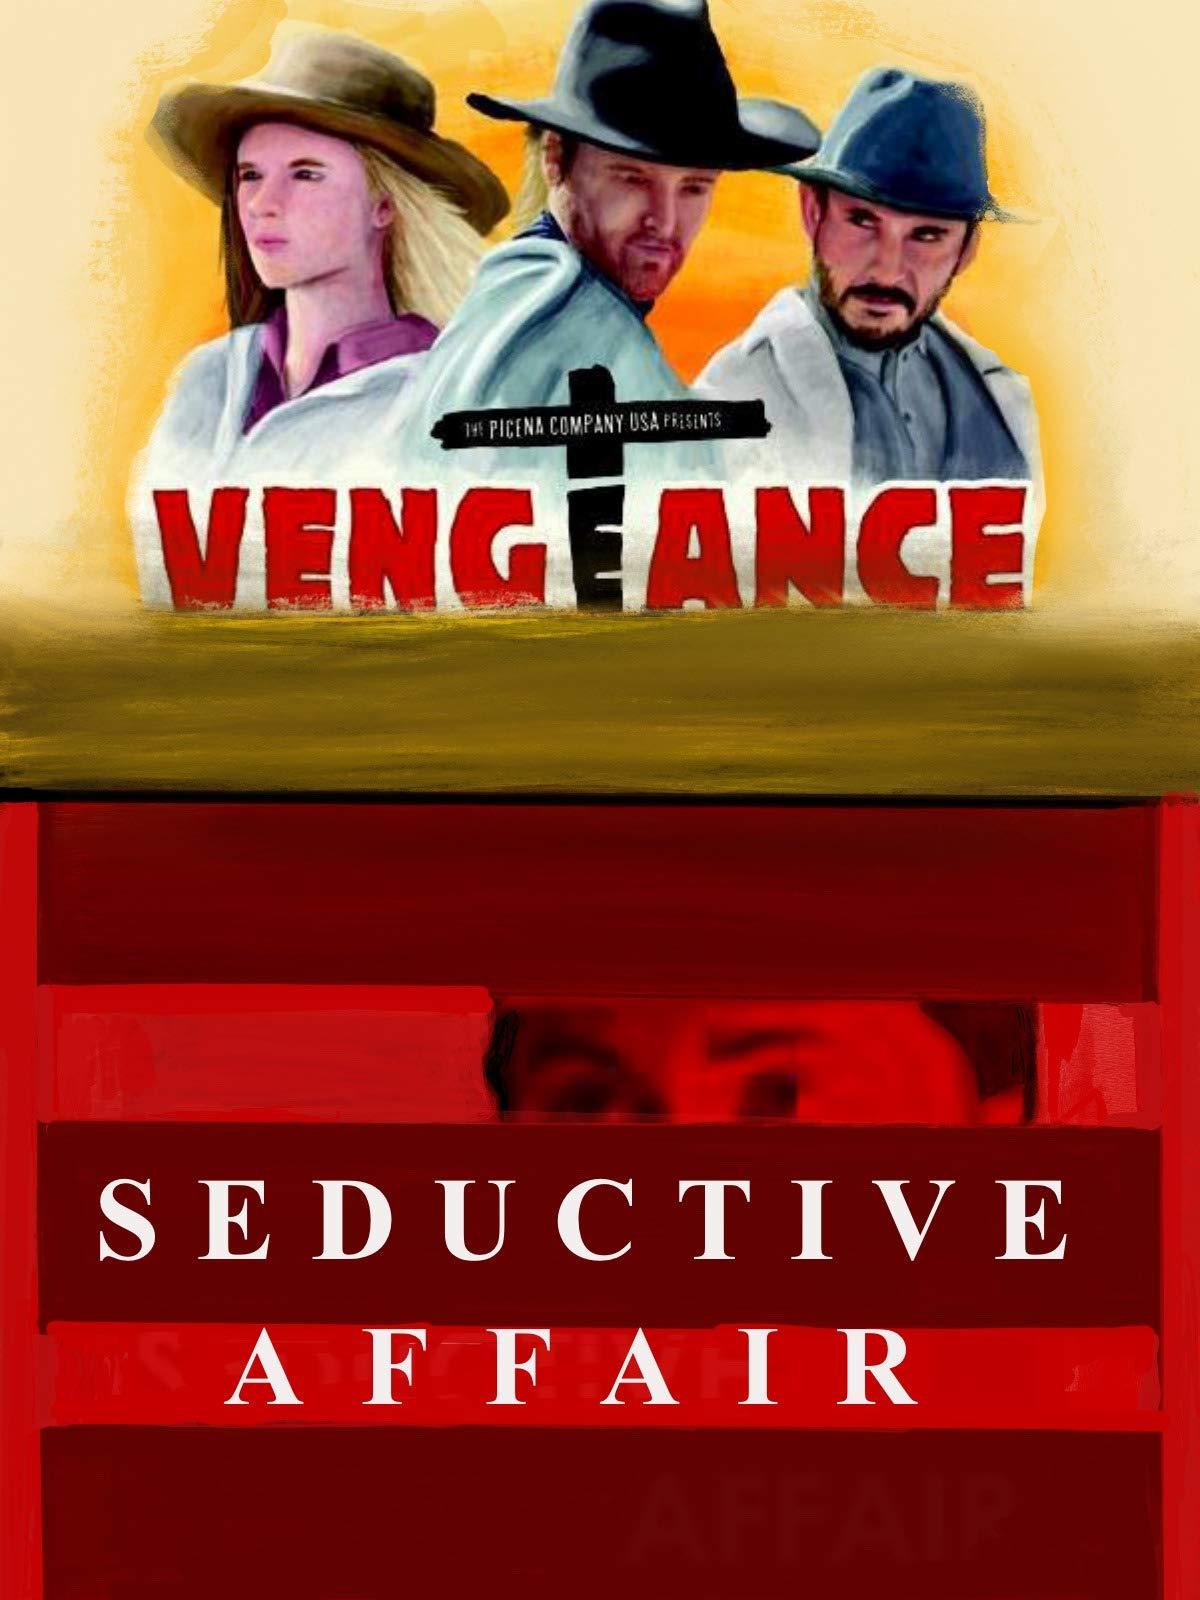 Seductive Affair and Vengeance